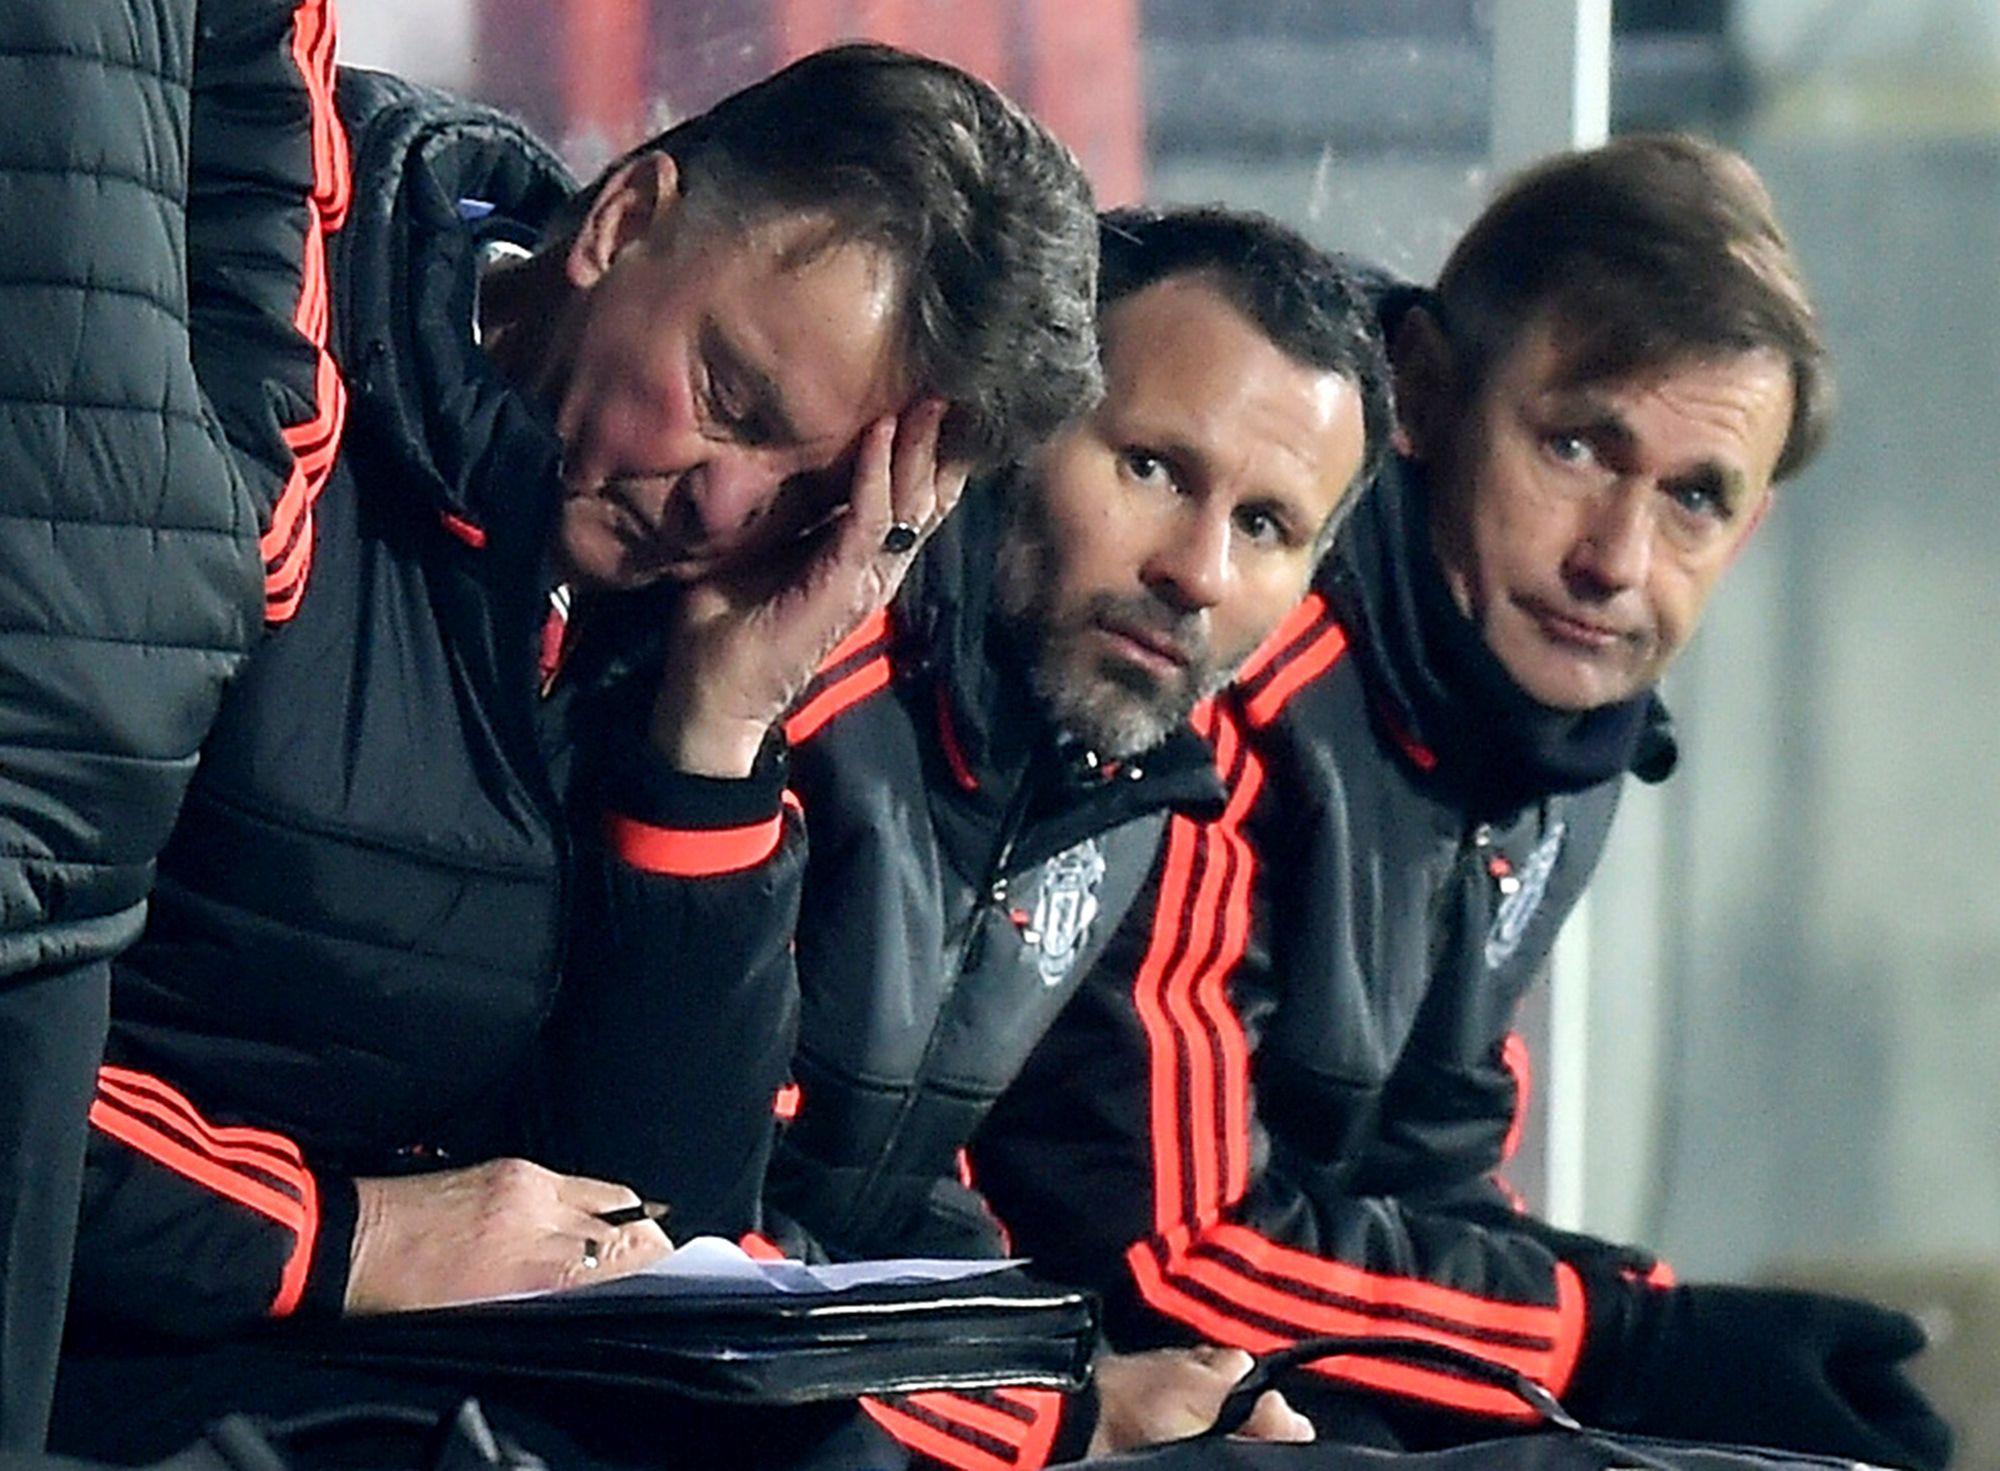 Manchester United manager Louis Van Gaal, left, in Herning on Thursday.